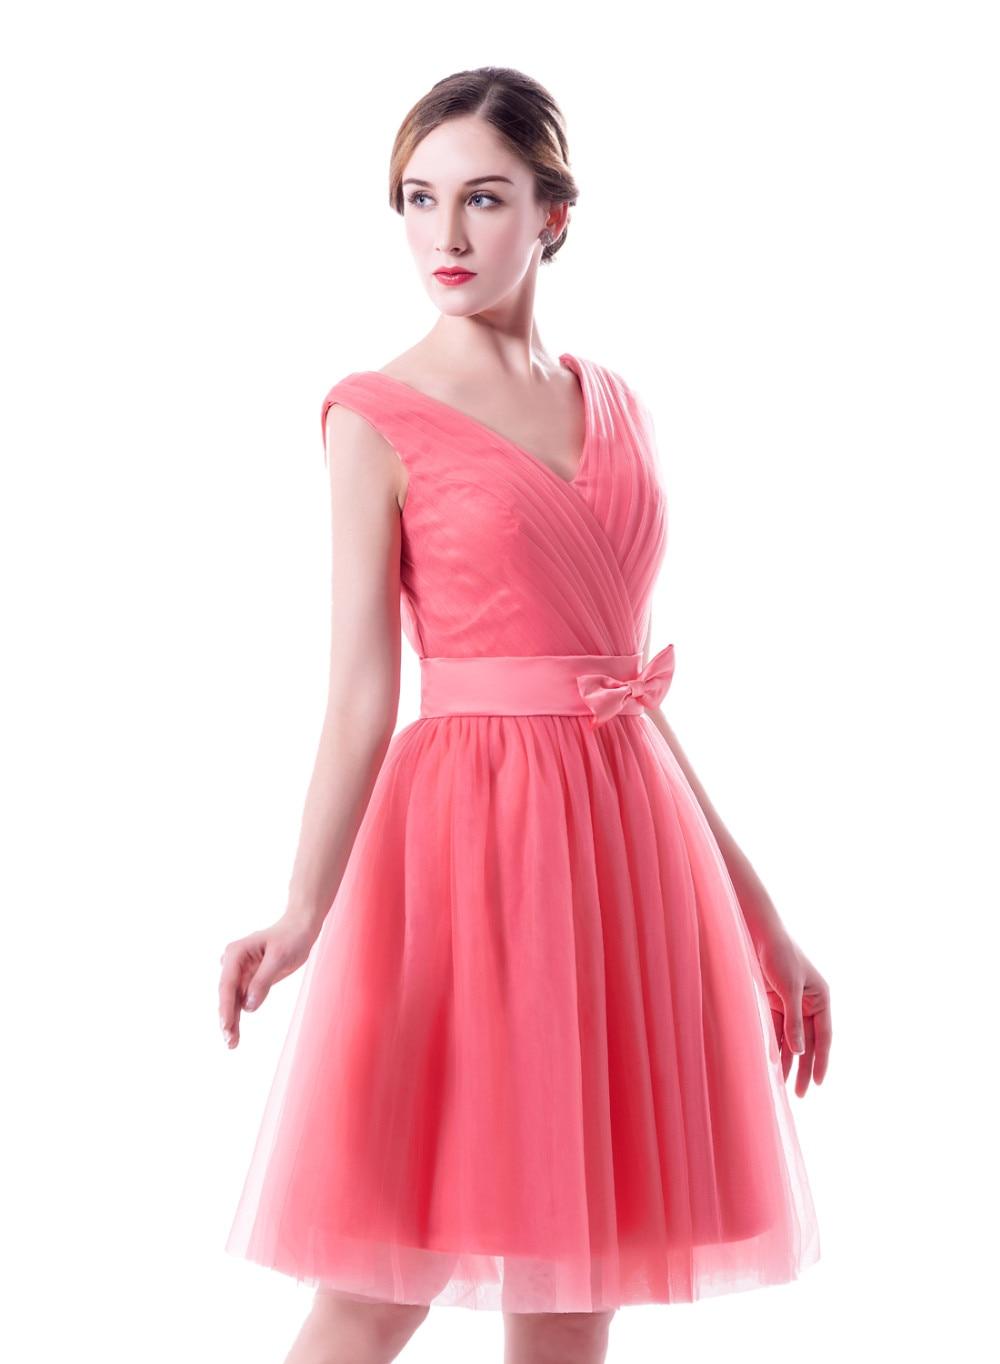 Increíble 0 Tamaño Vestidos De Dama Modelo - Colección de Vestidos ...